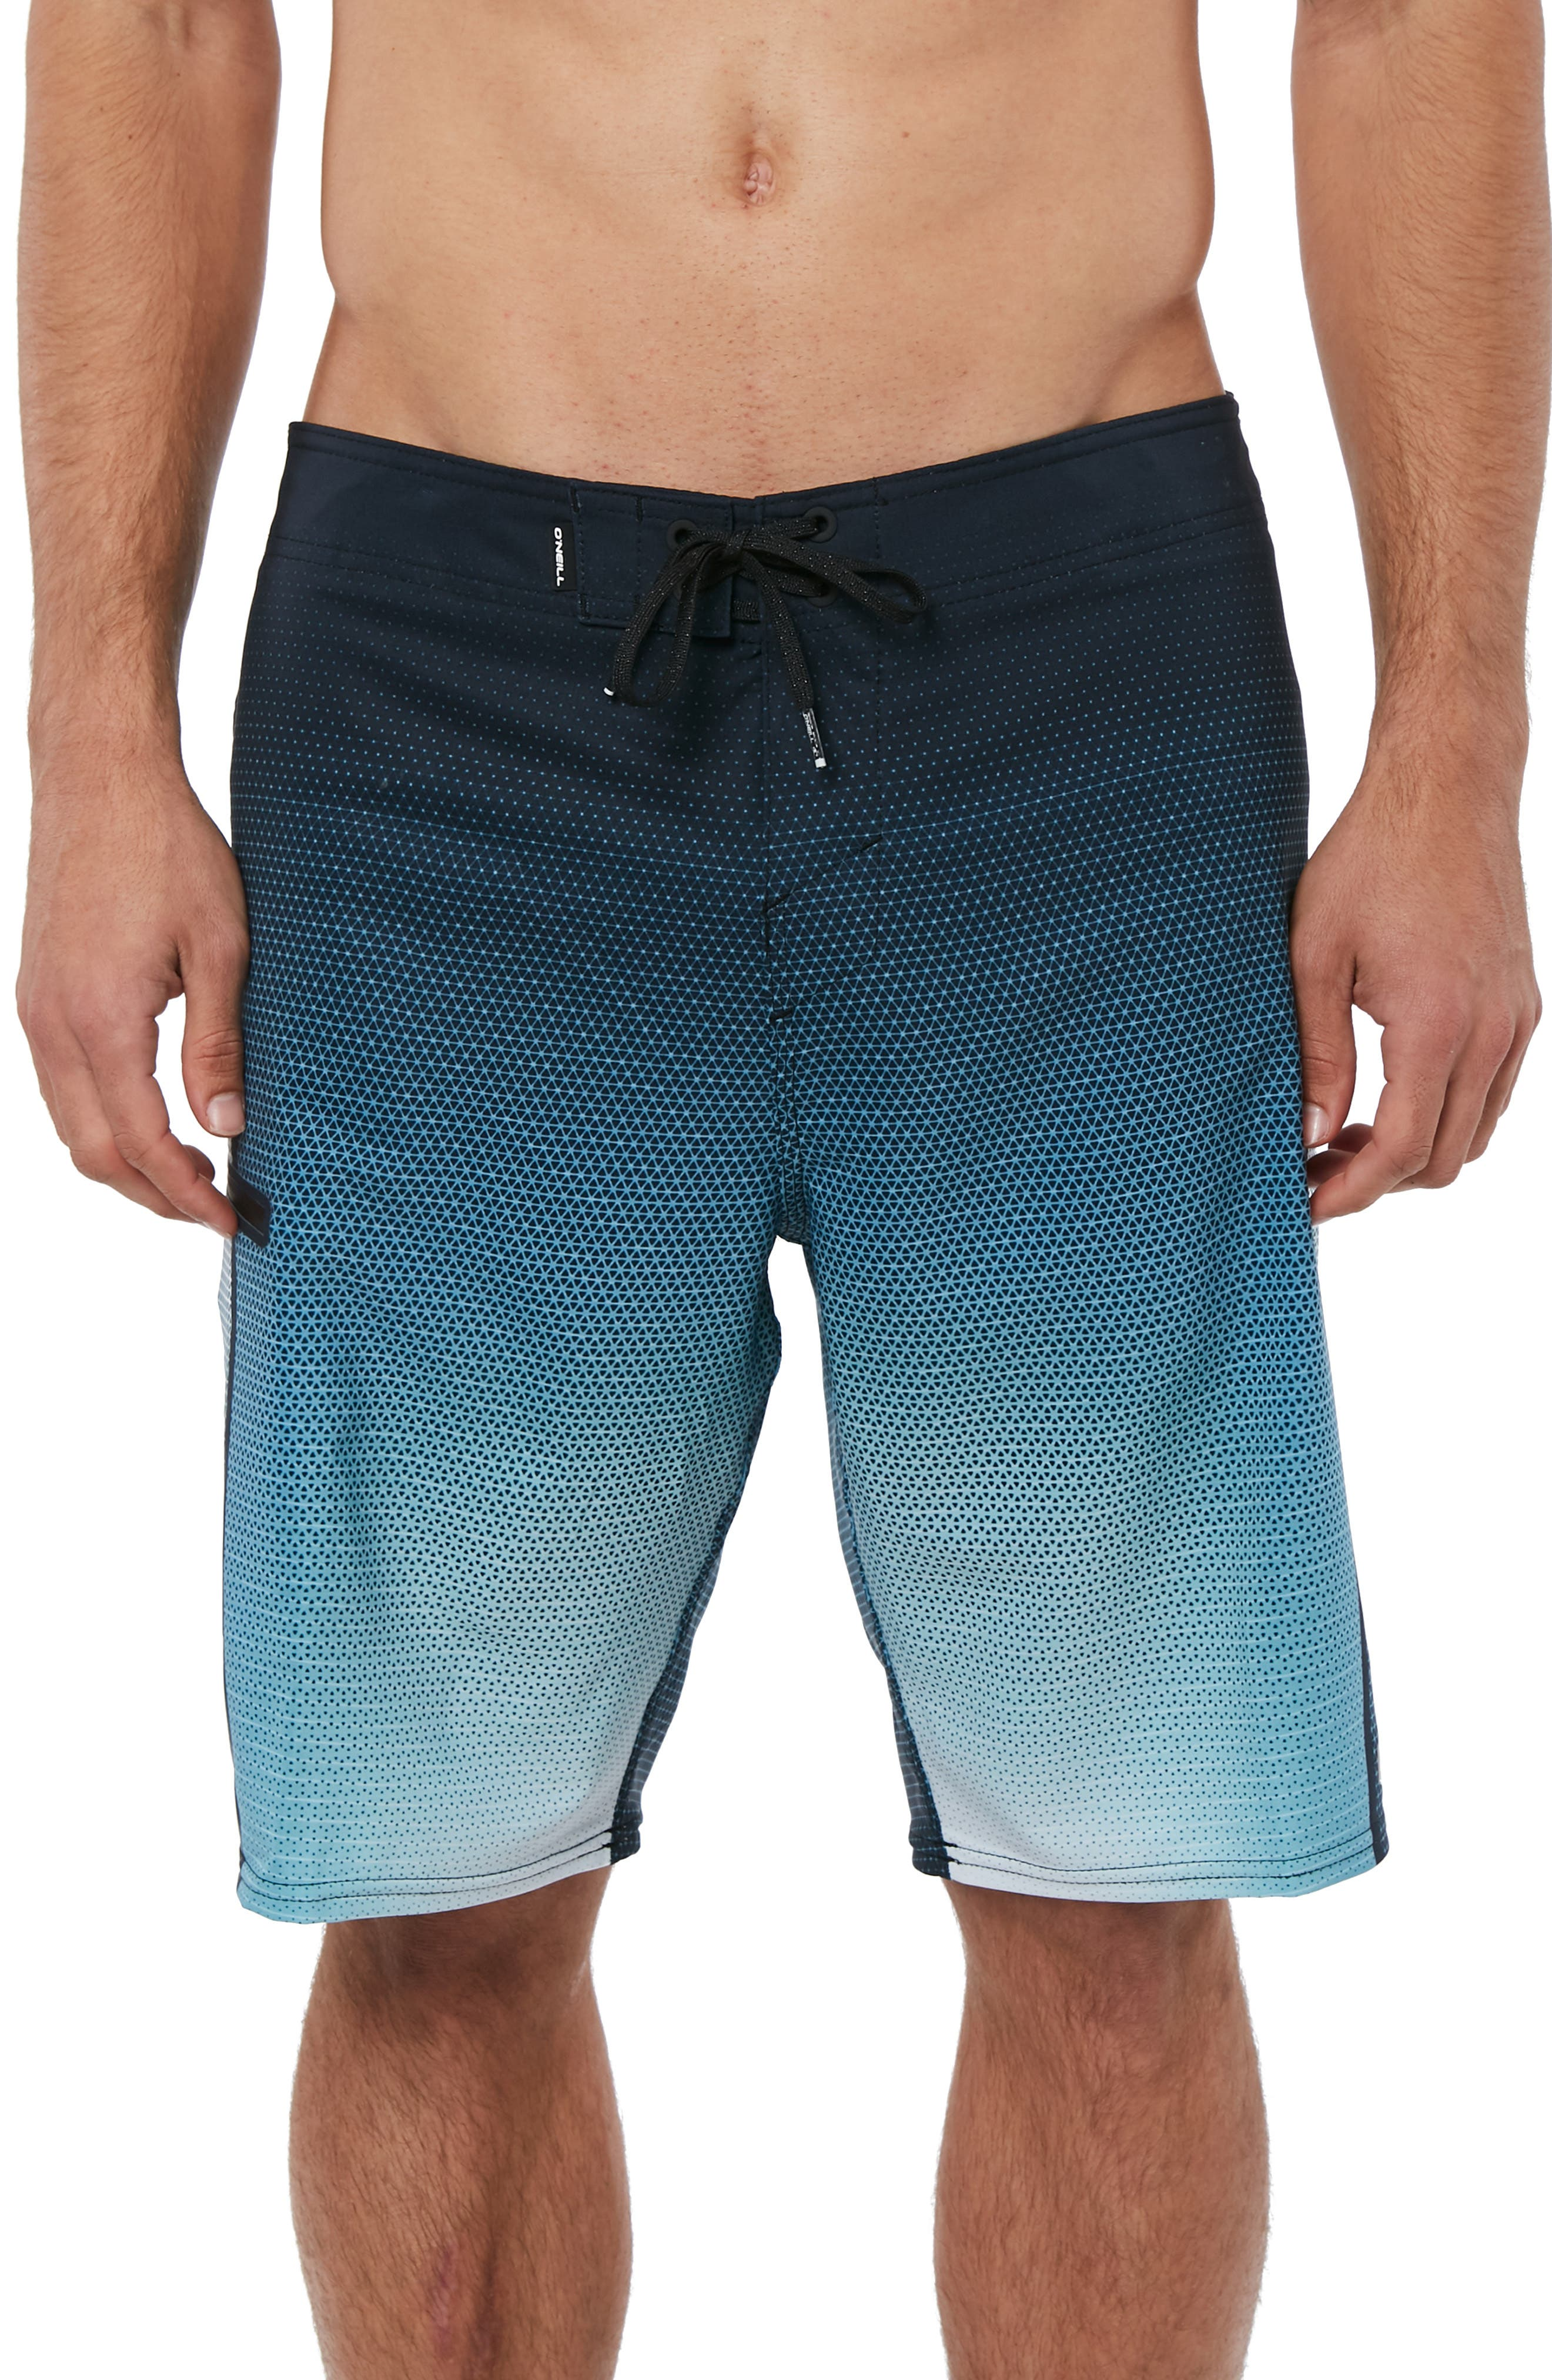 Hyperfreak Prizma Board Shorts,                             Main thumbnail 1, color,                             TEAL